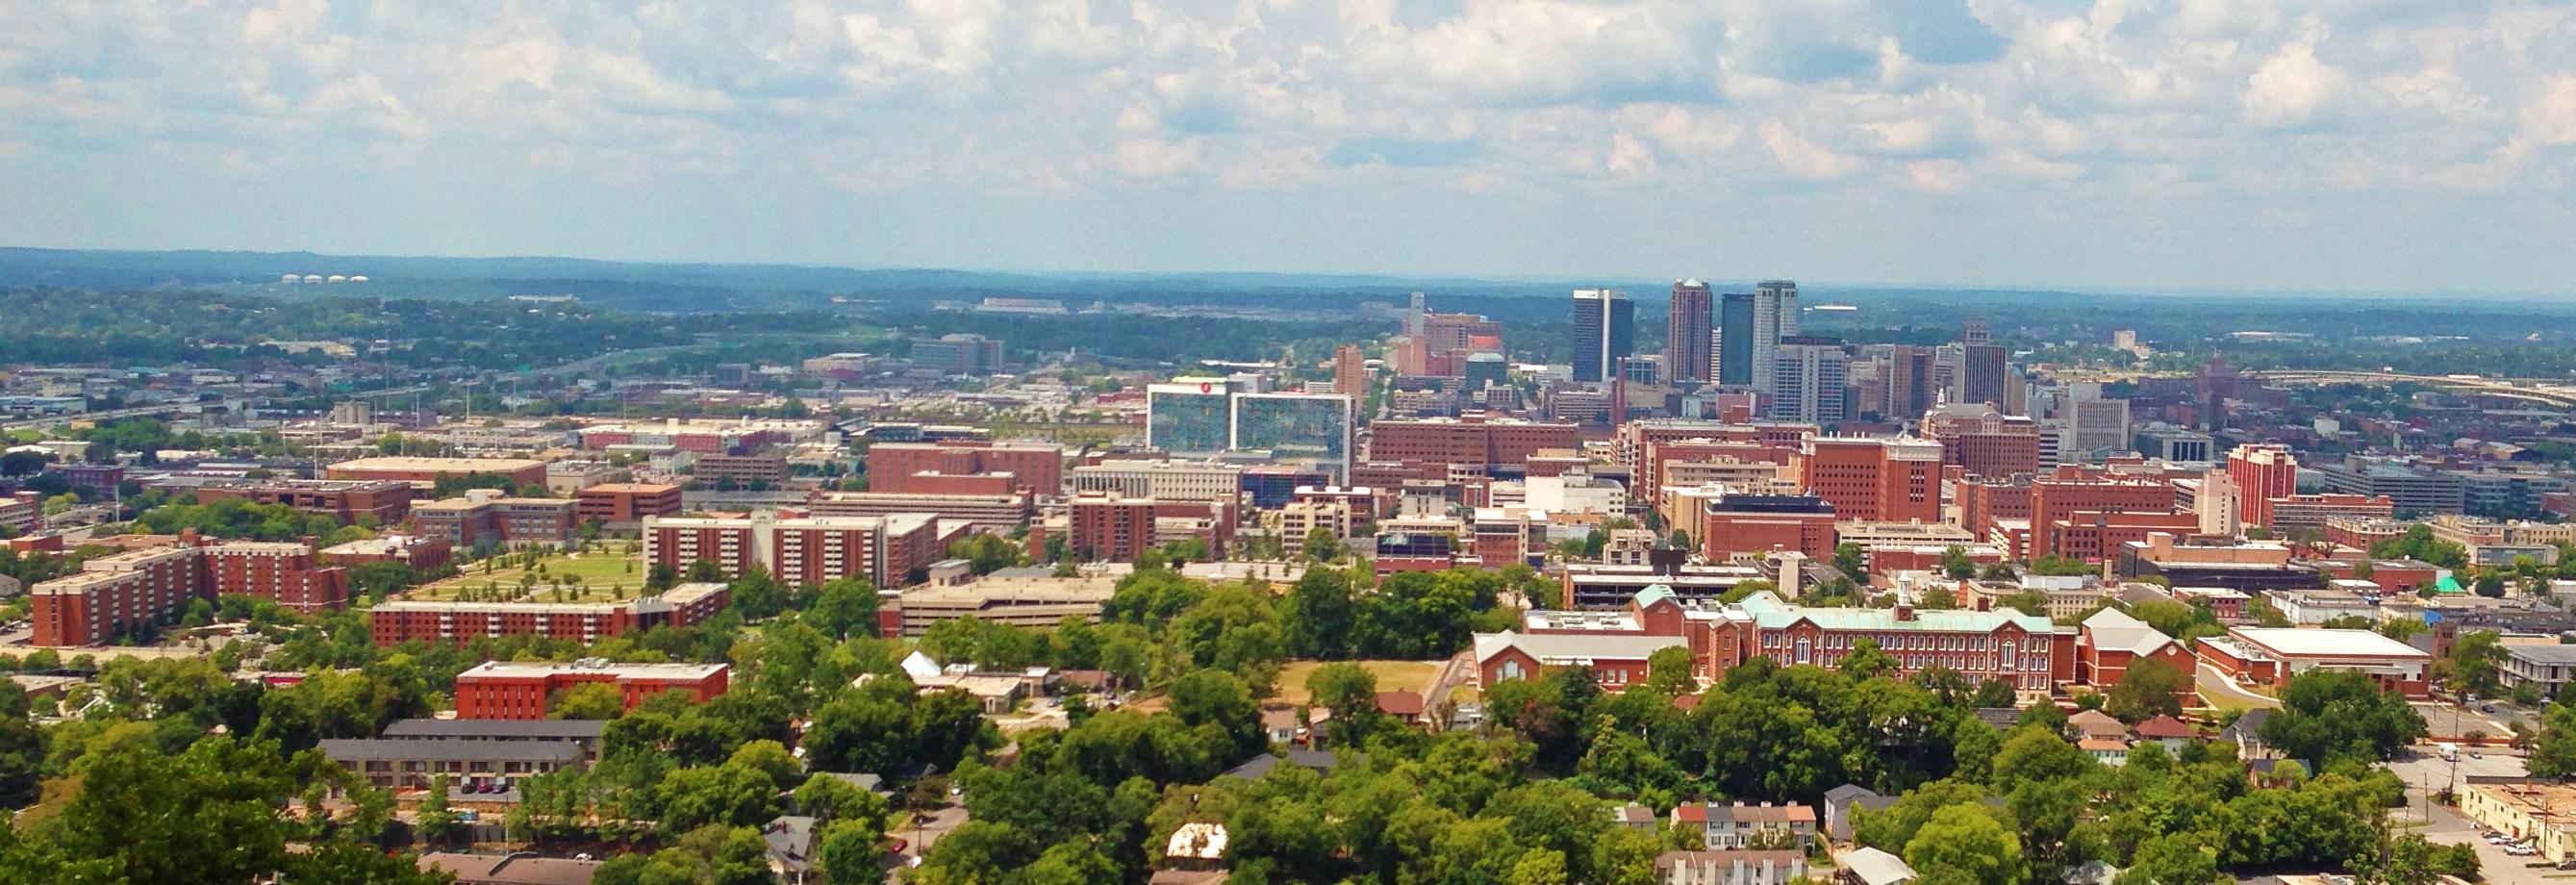 Parkinson research at University of Alabama